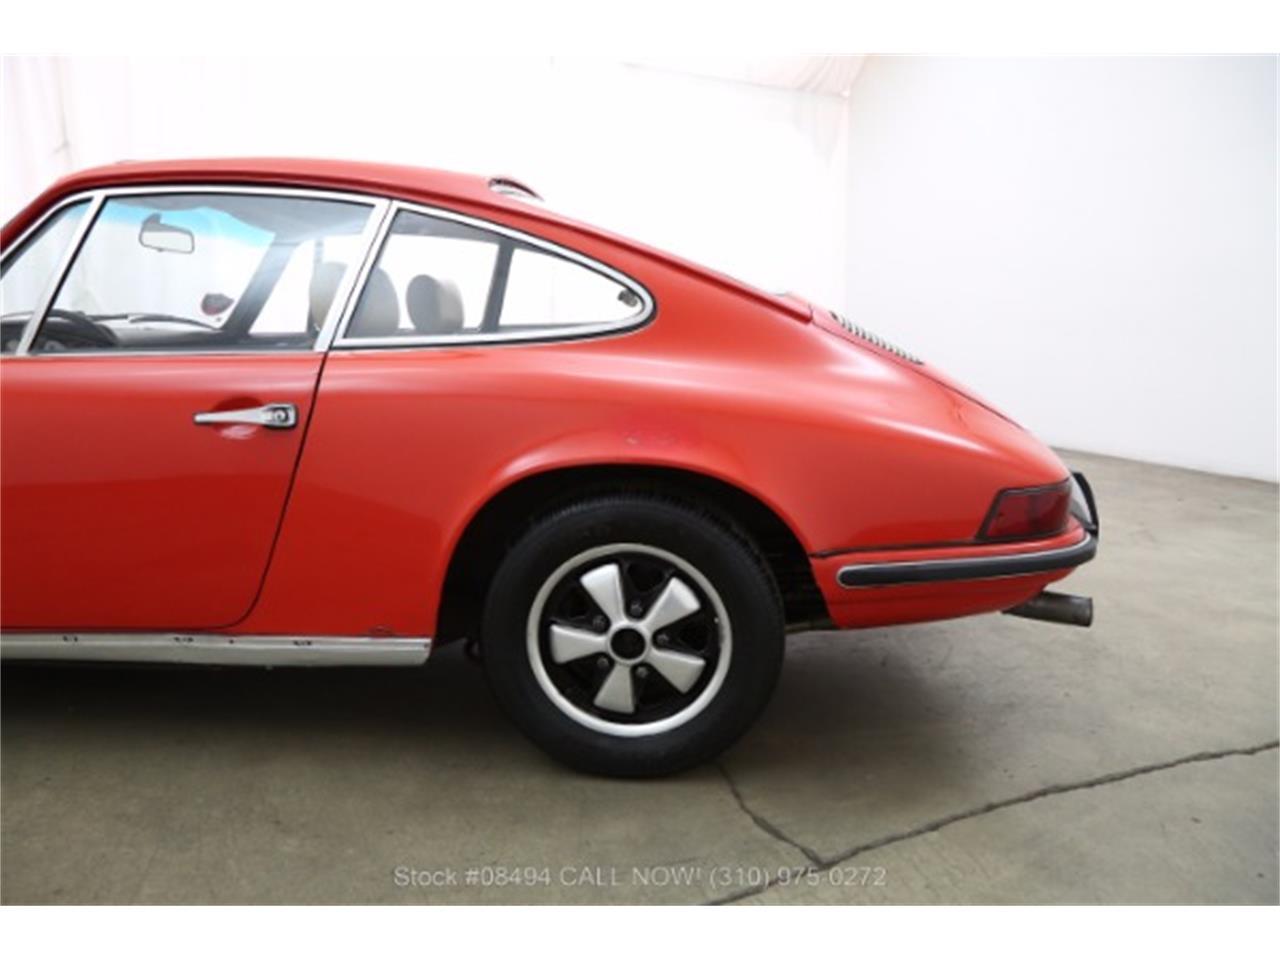 Large Picture of '69 Porsche 911E located in California - LCGT